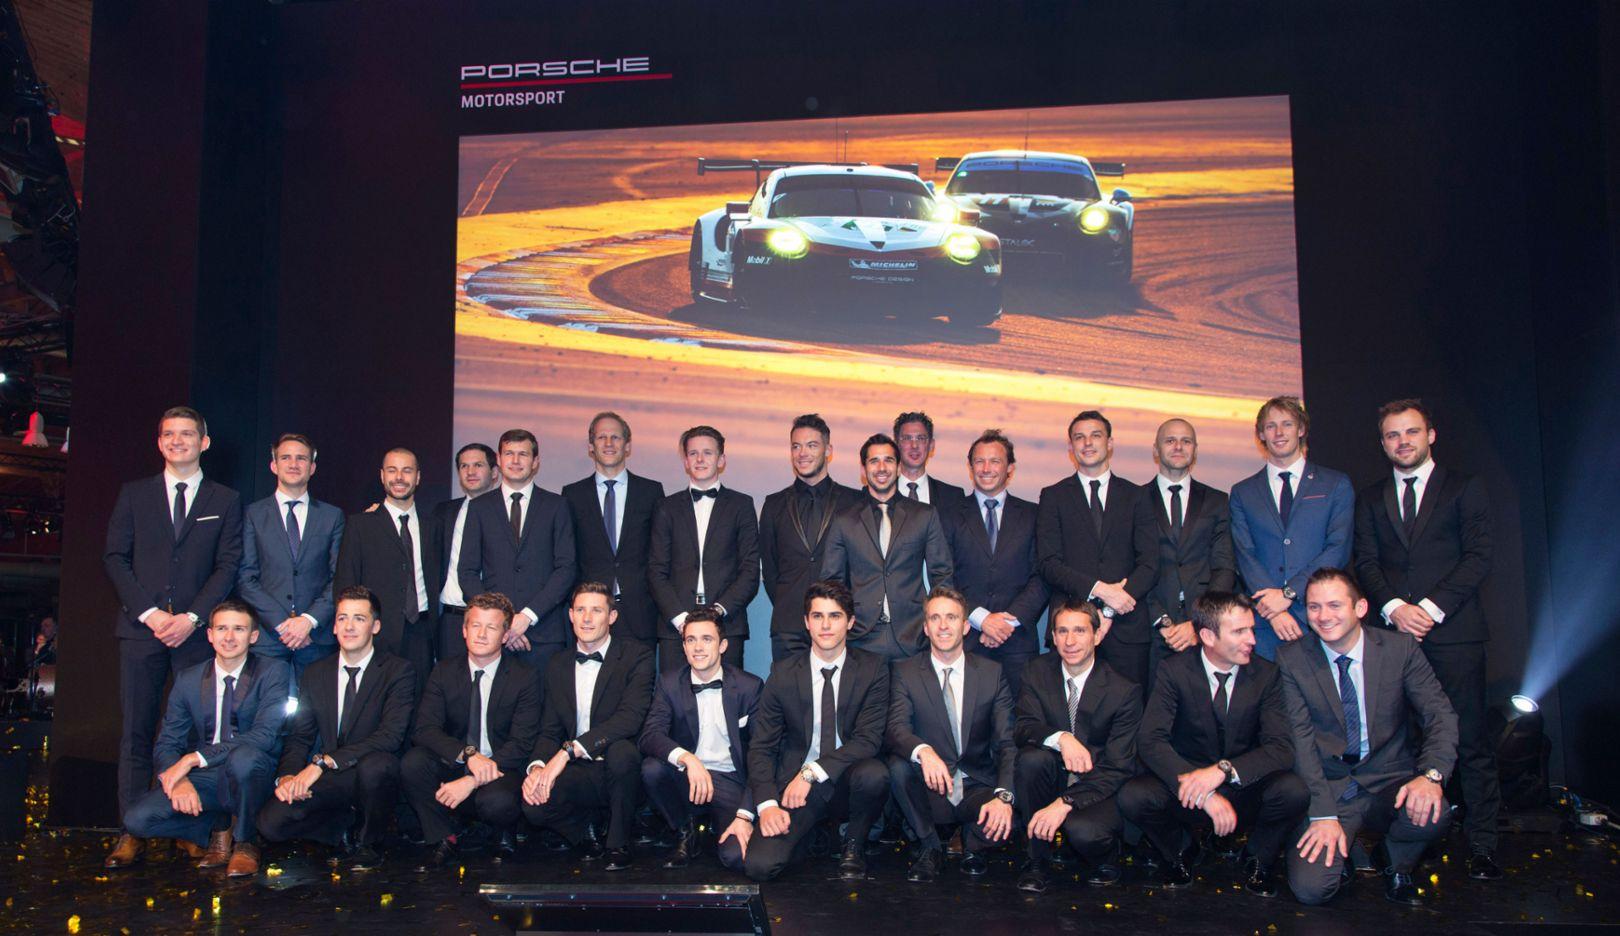 Porsche Night of Champions, Weissach, 12/09/2017, Porsche AG